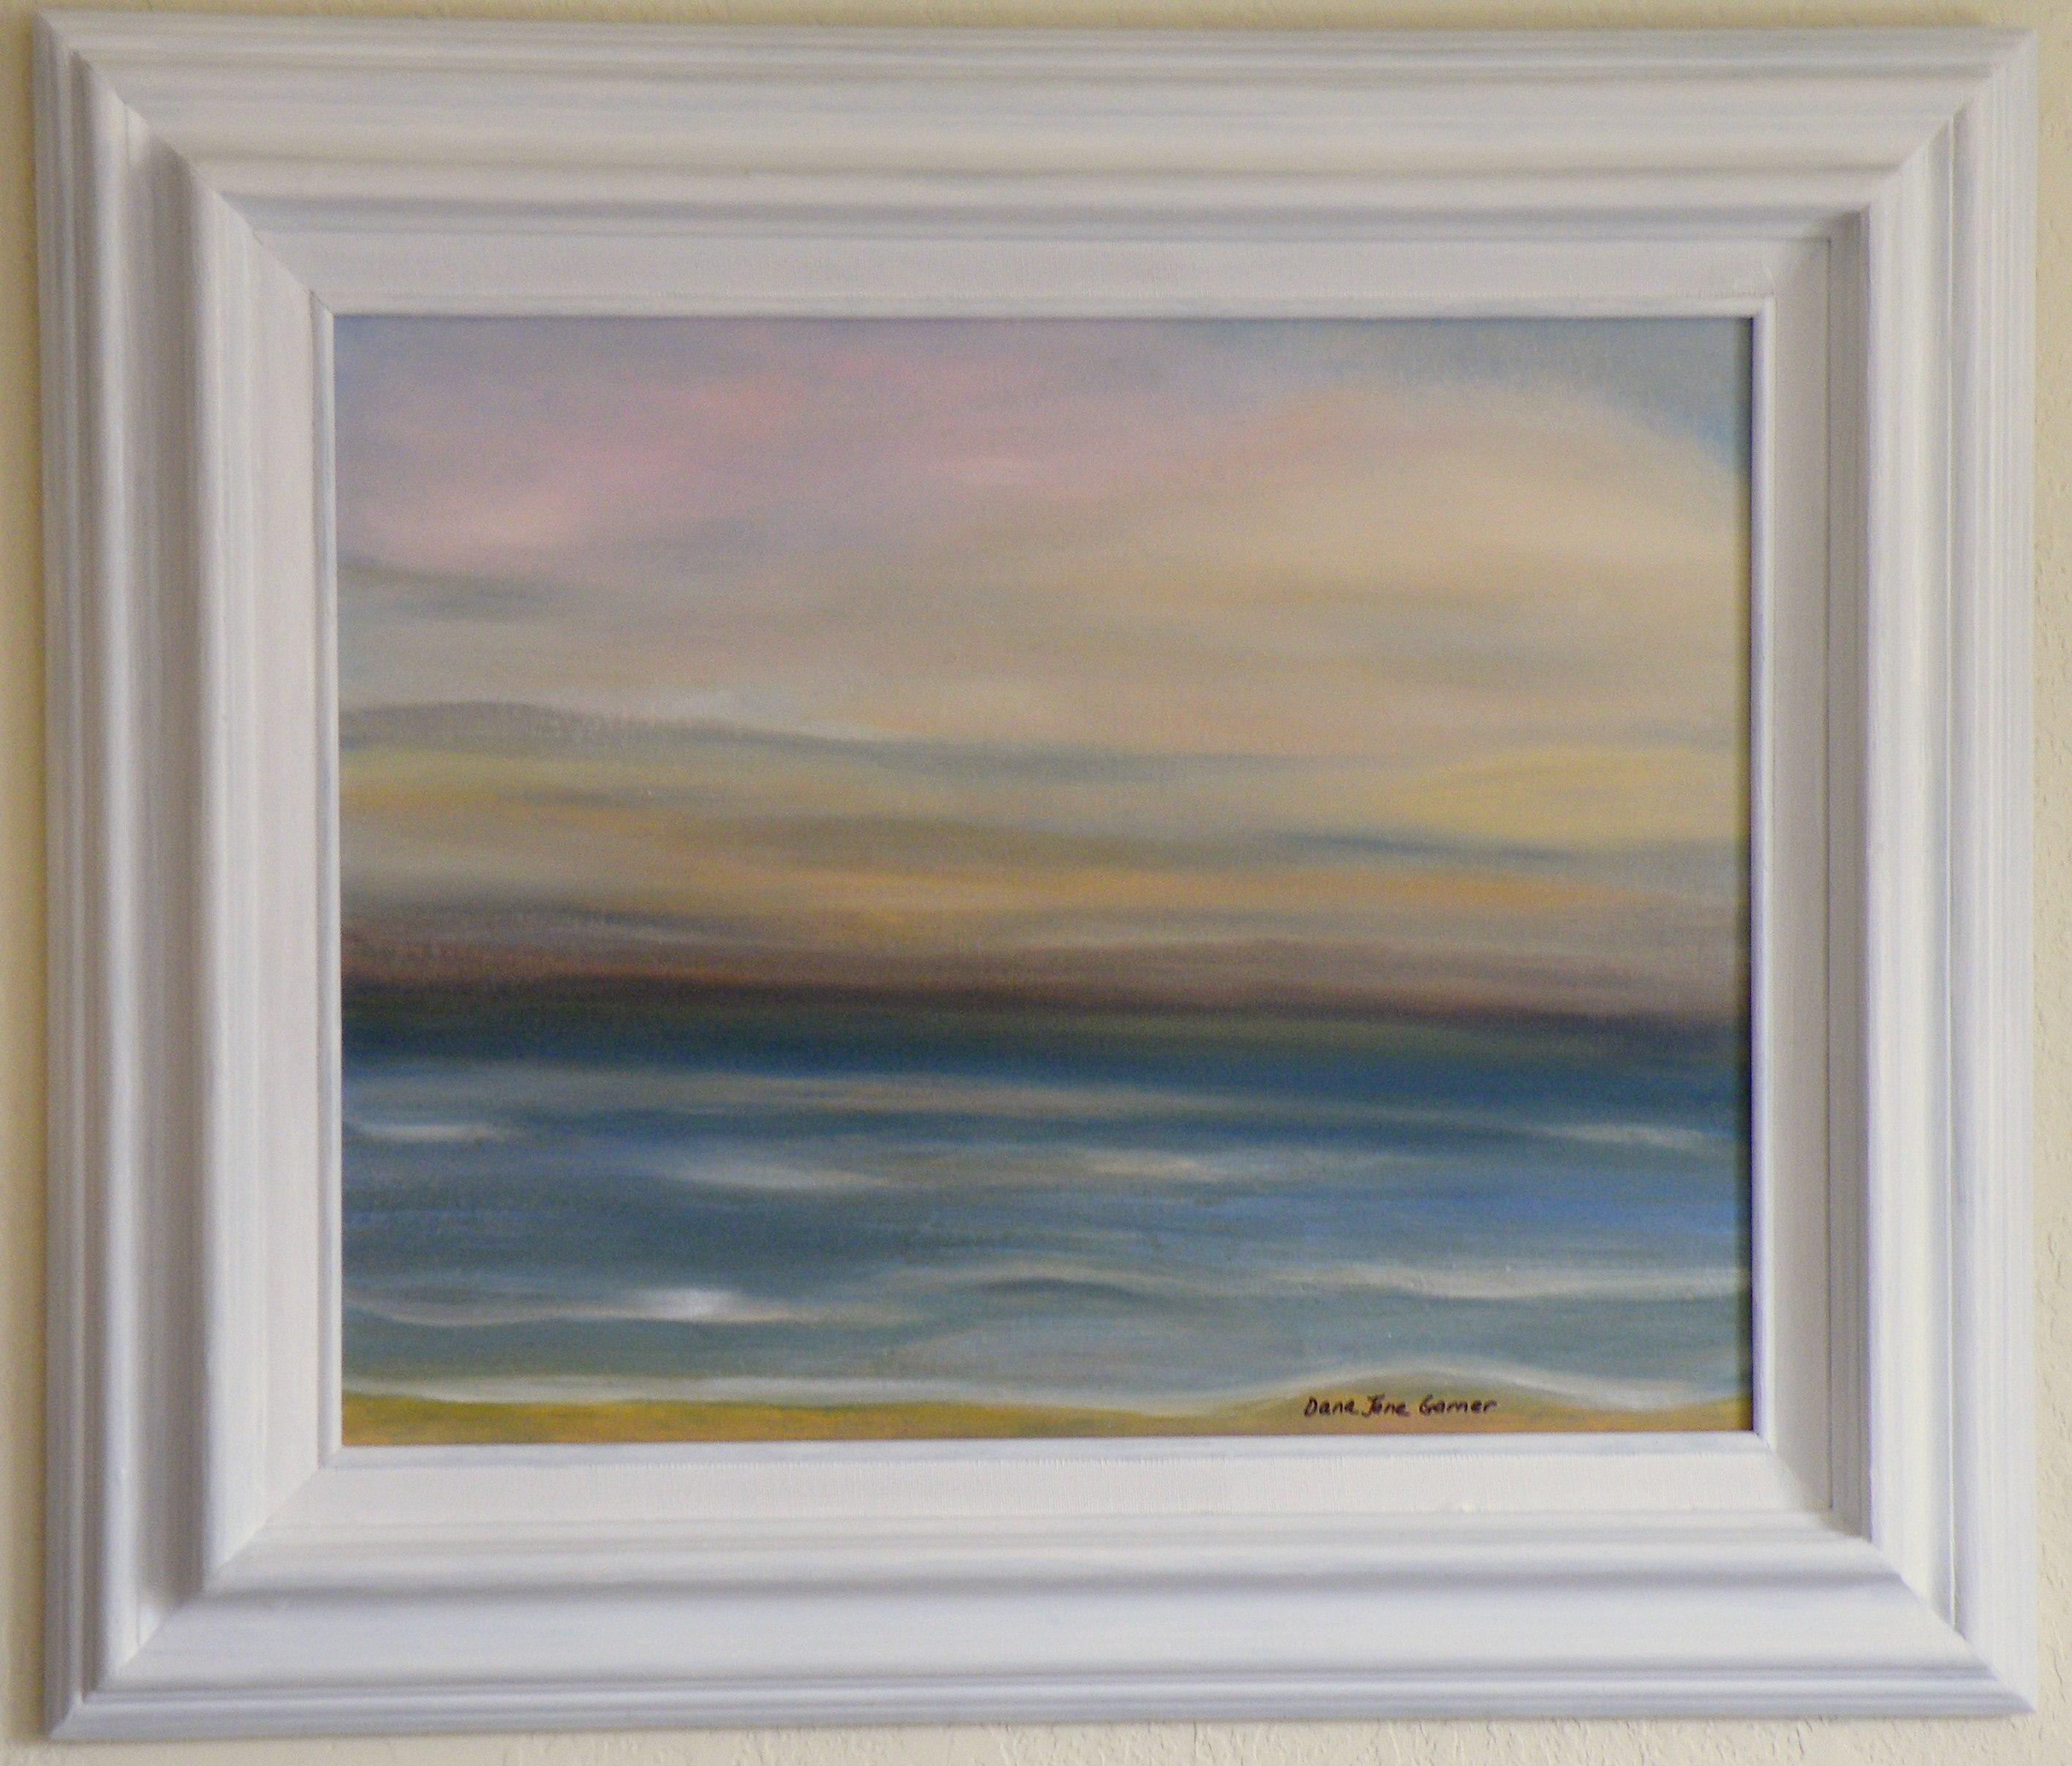 calming lake 16x20 oil on canvas board large frame 375 dana jane